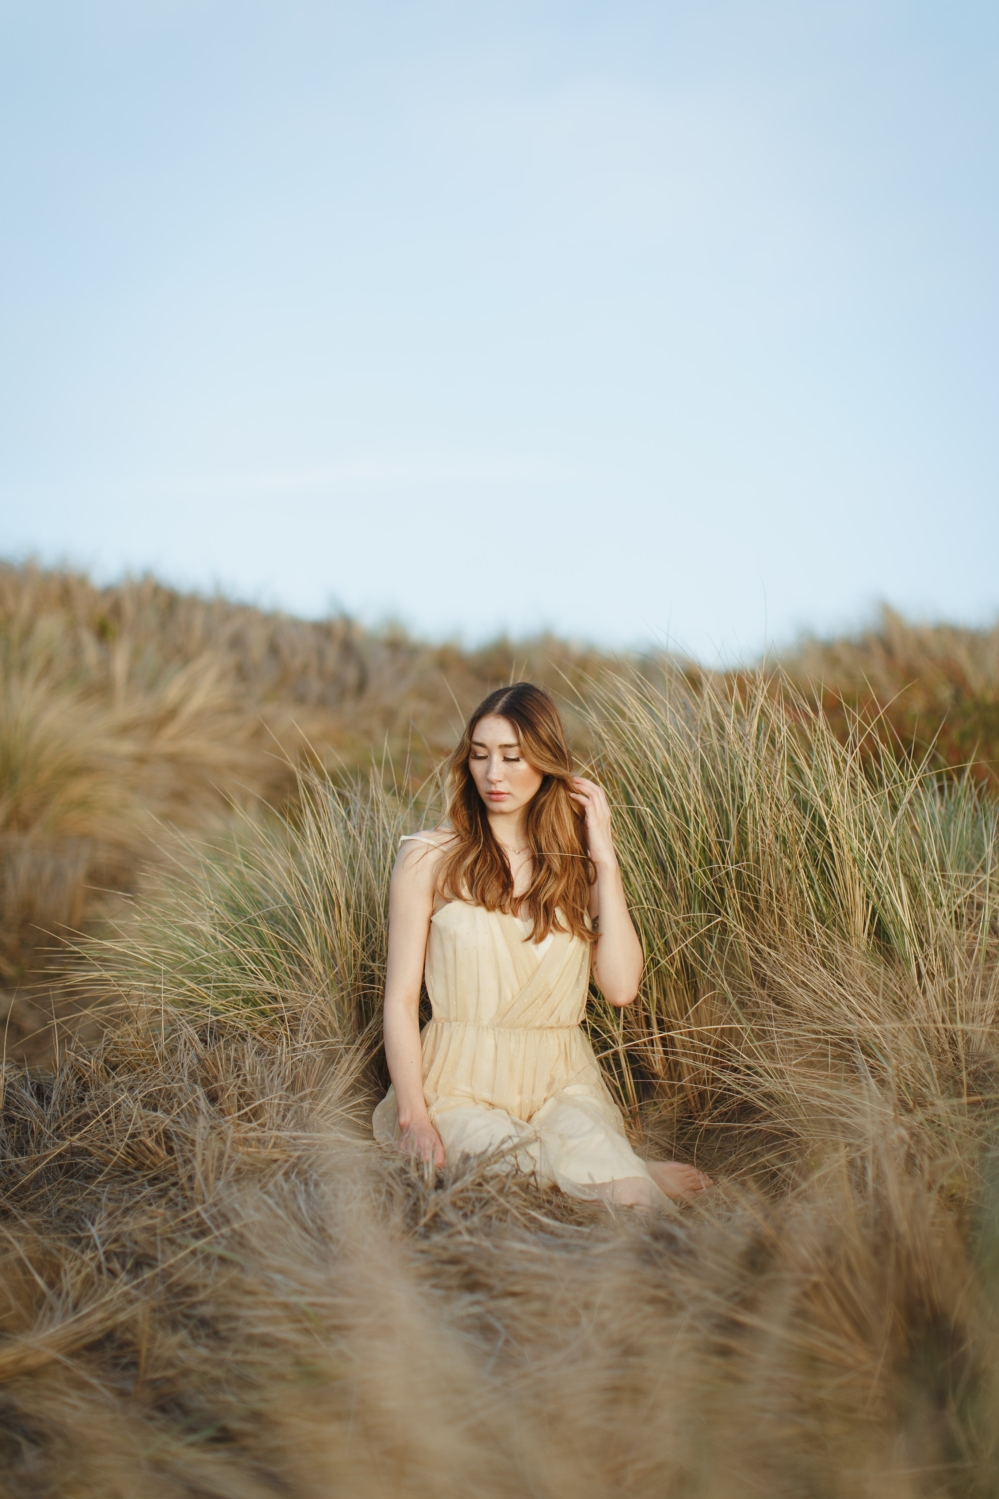 ephemeral-alyssa-nicole-ocean-beach-2